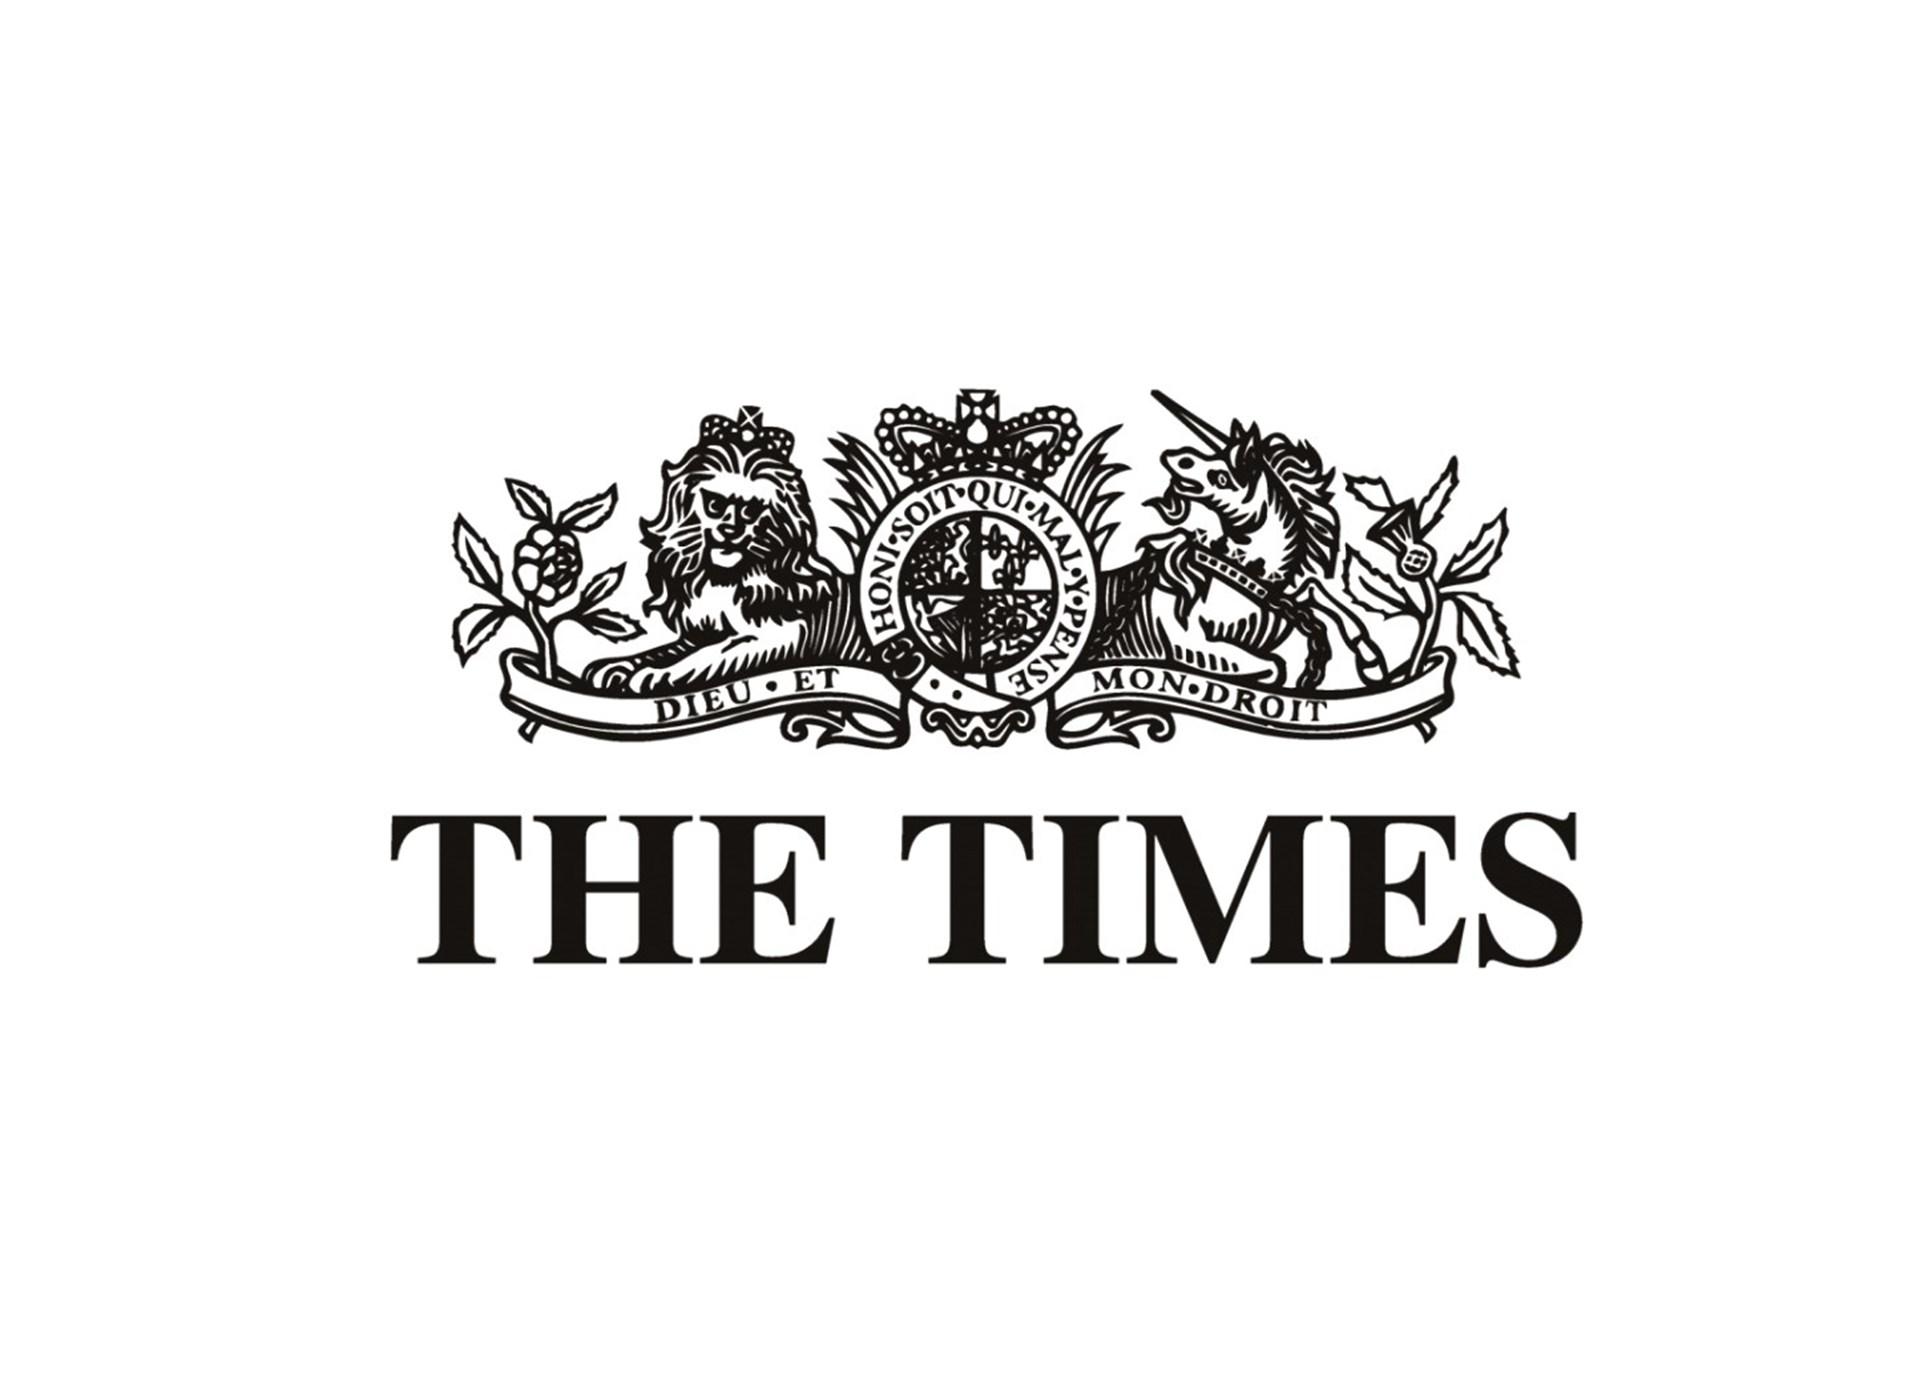 Arj Thiruchelvam in The Times